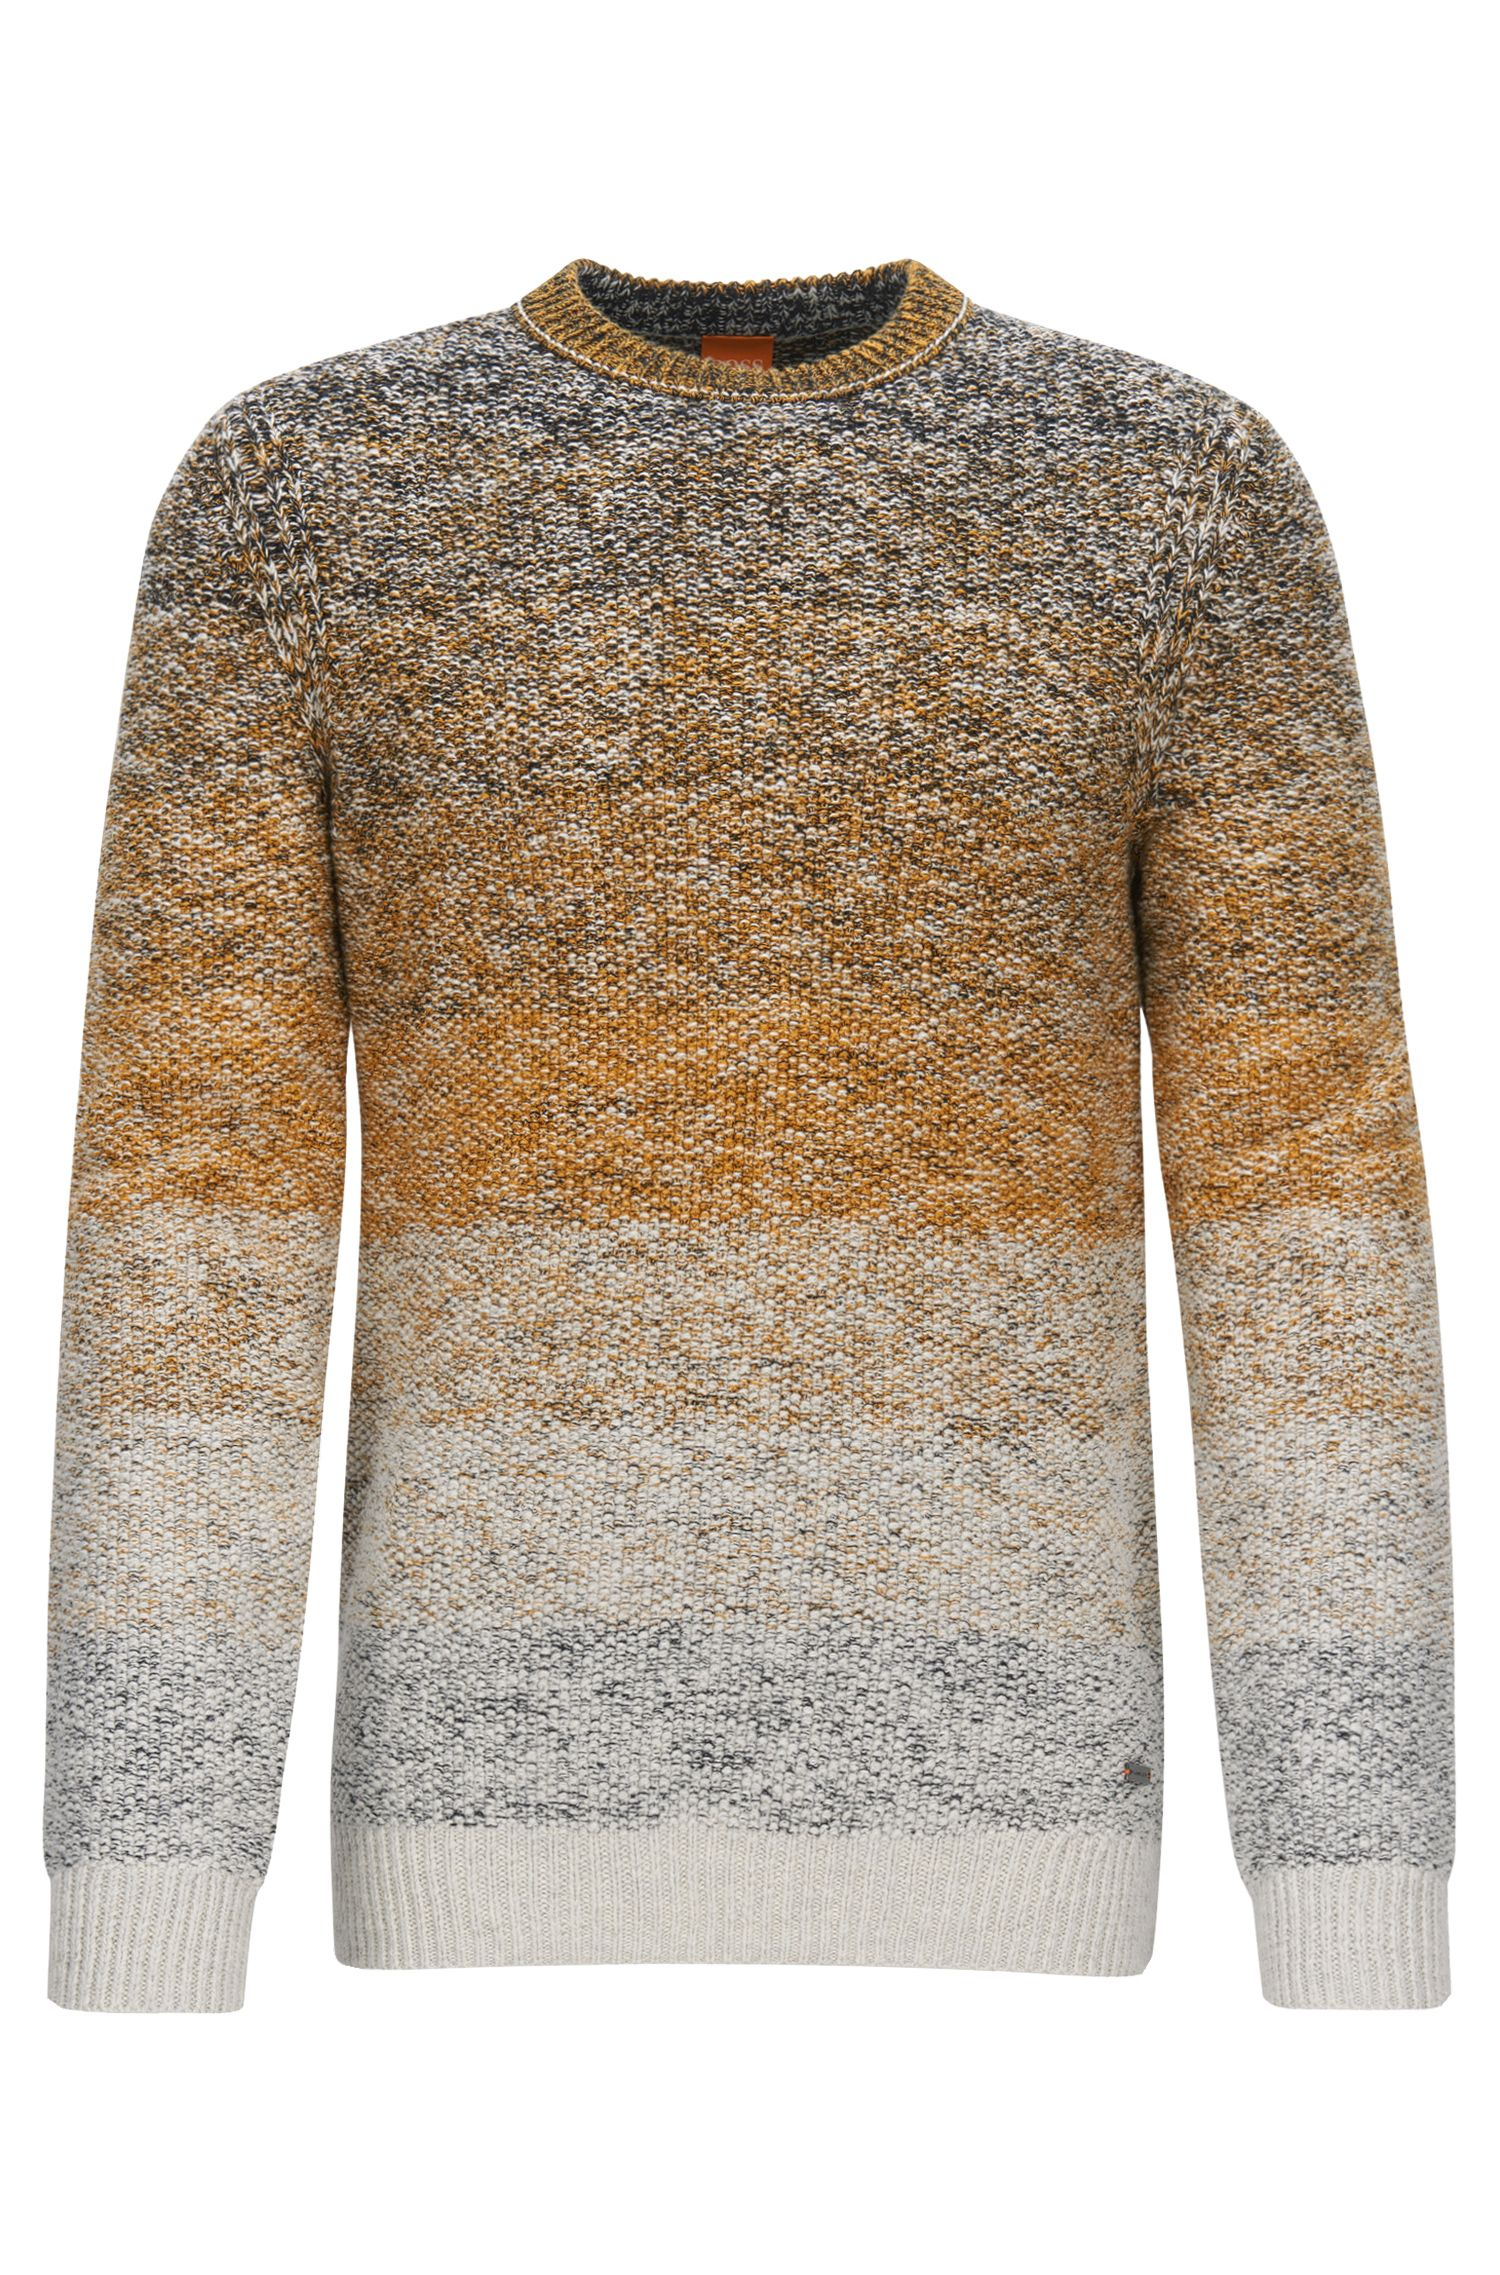 'Arduage' | Gradient Cotton Sweater